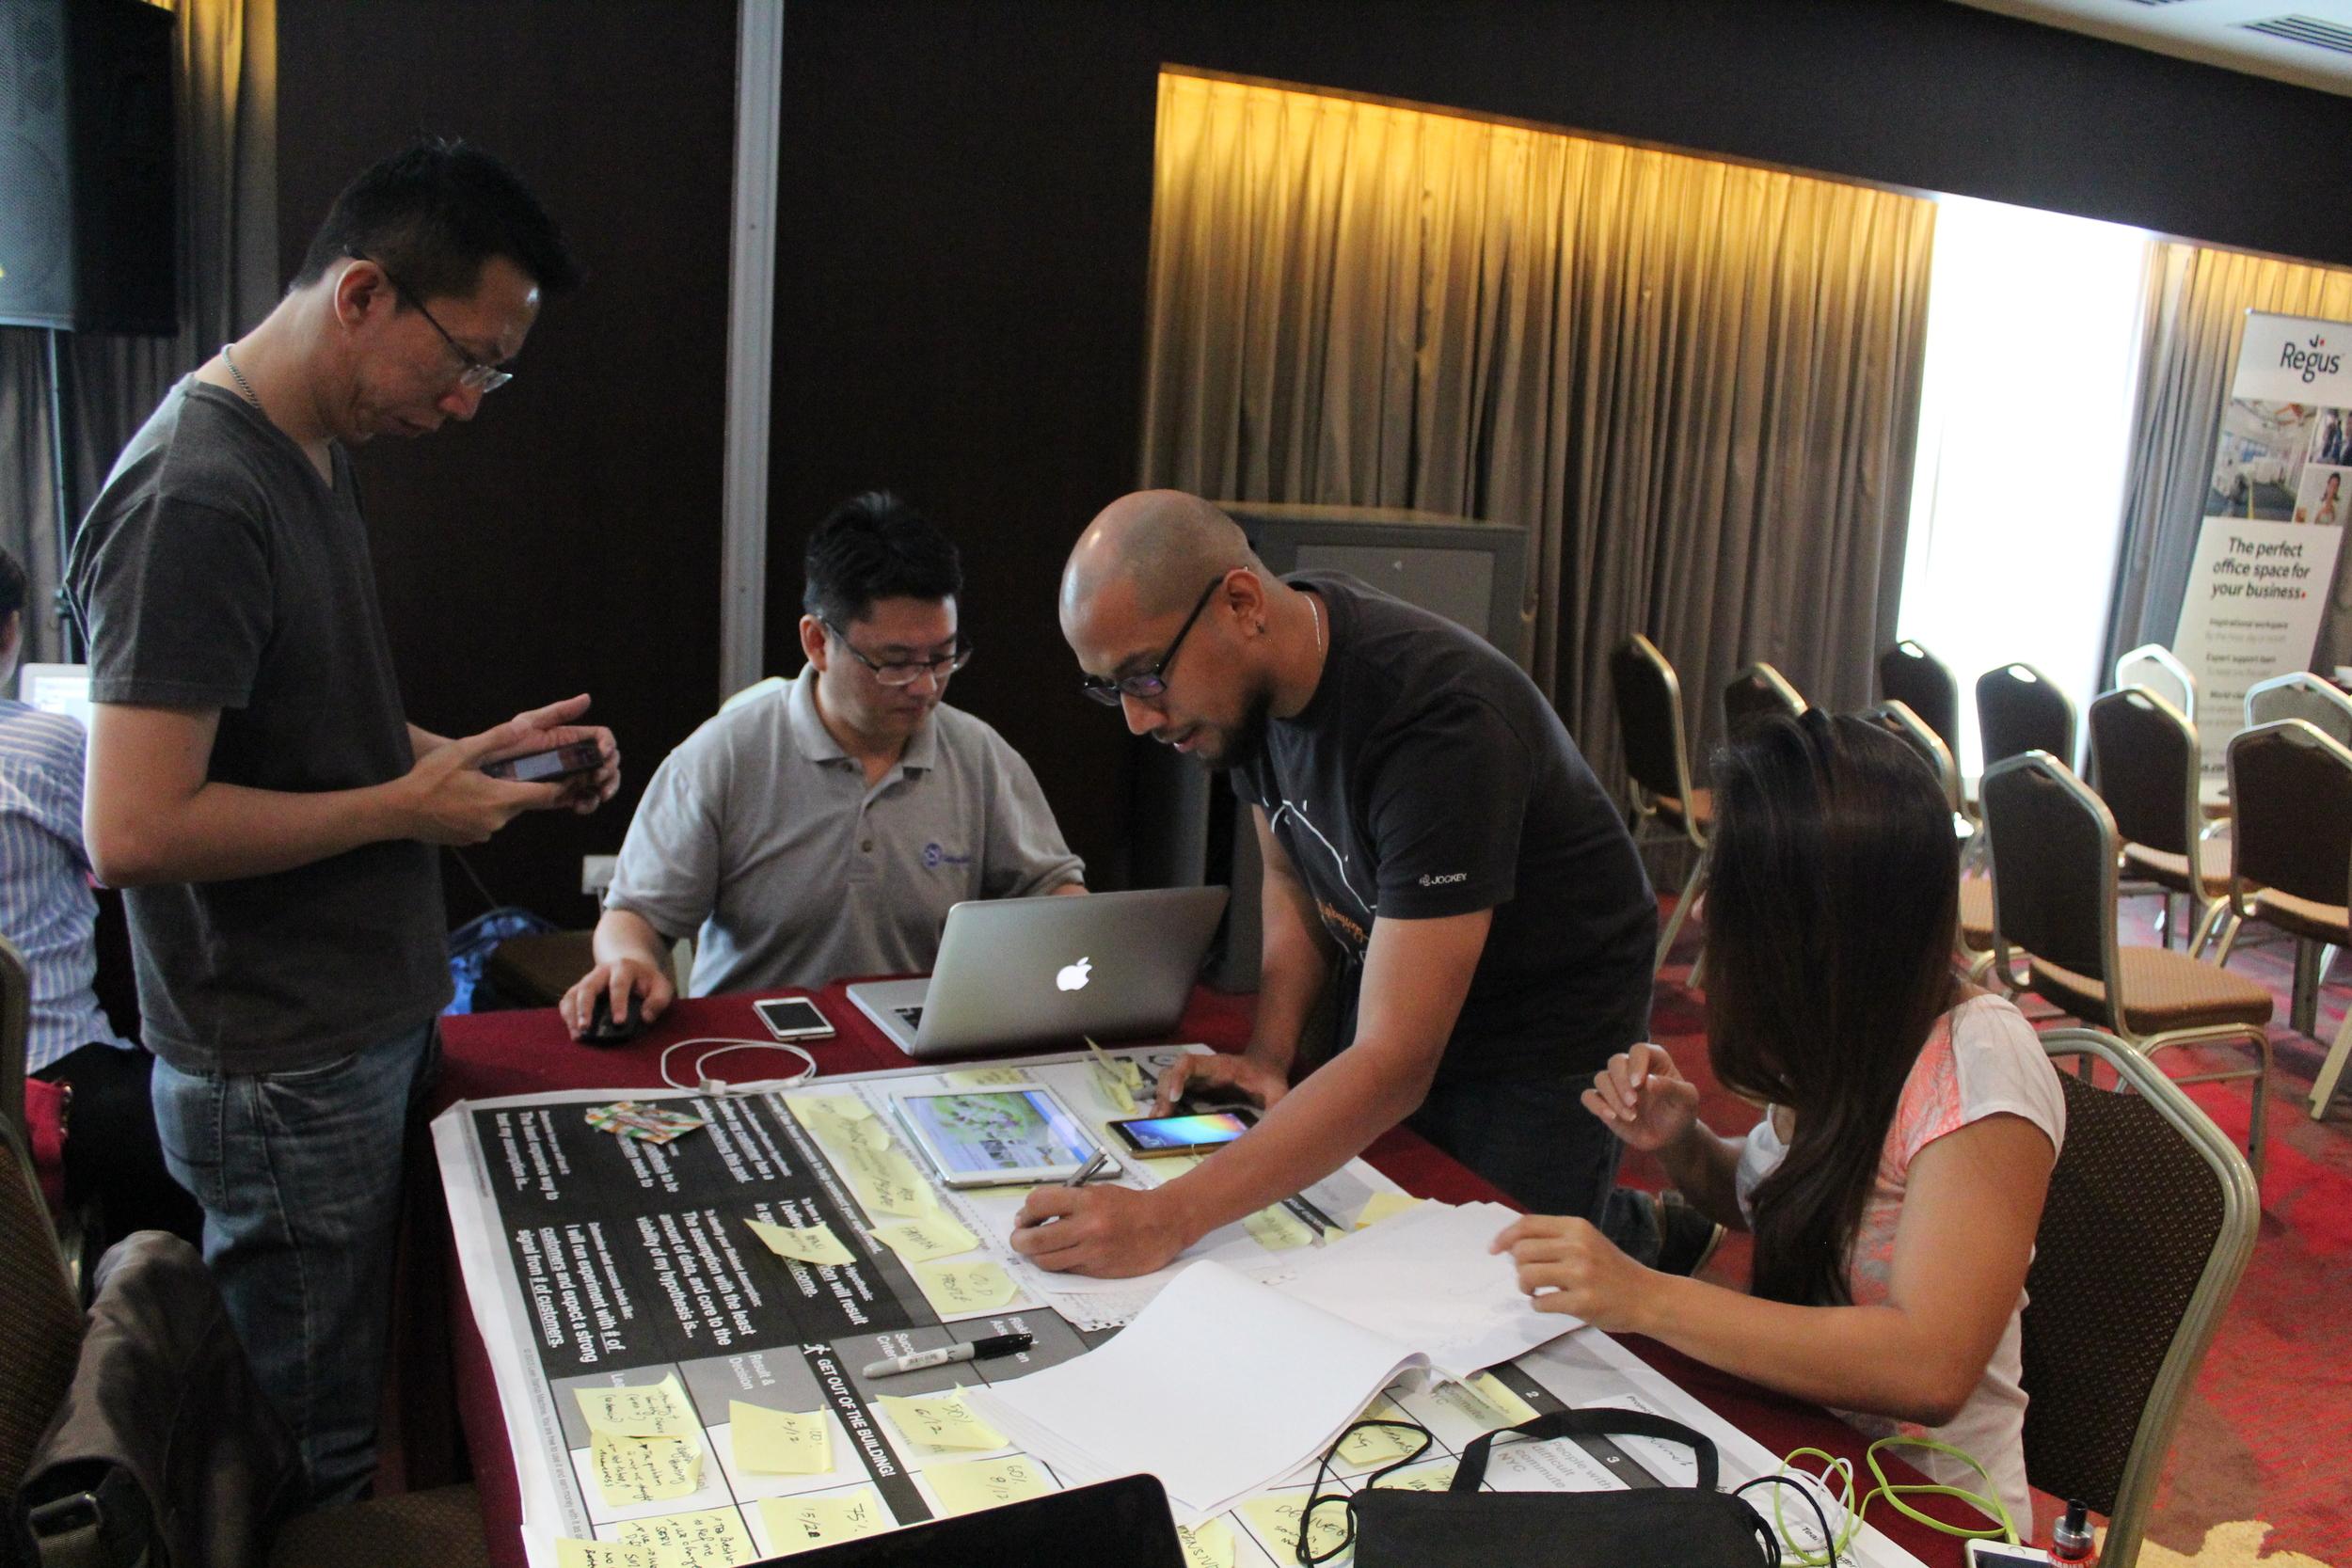 Miao Team working on their Vegetarian Cuisine idea